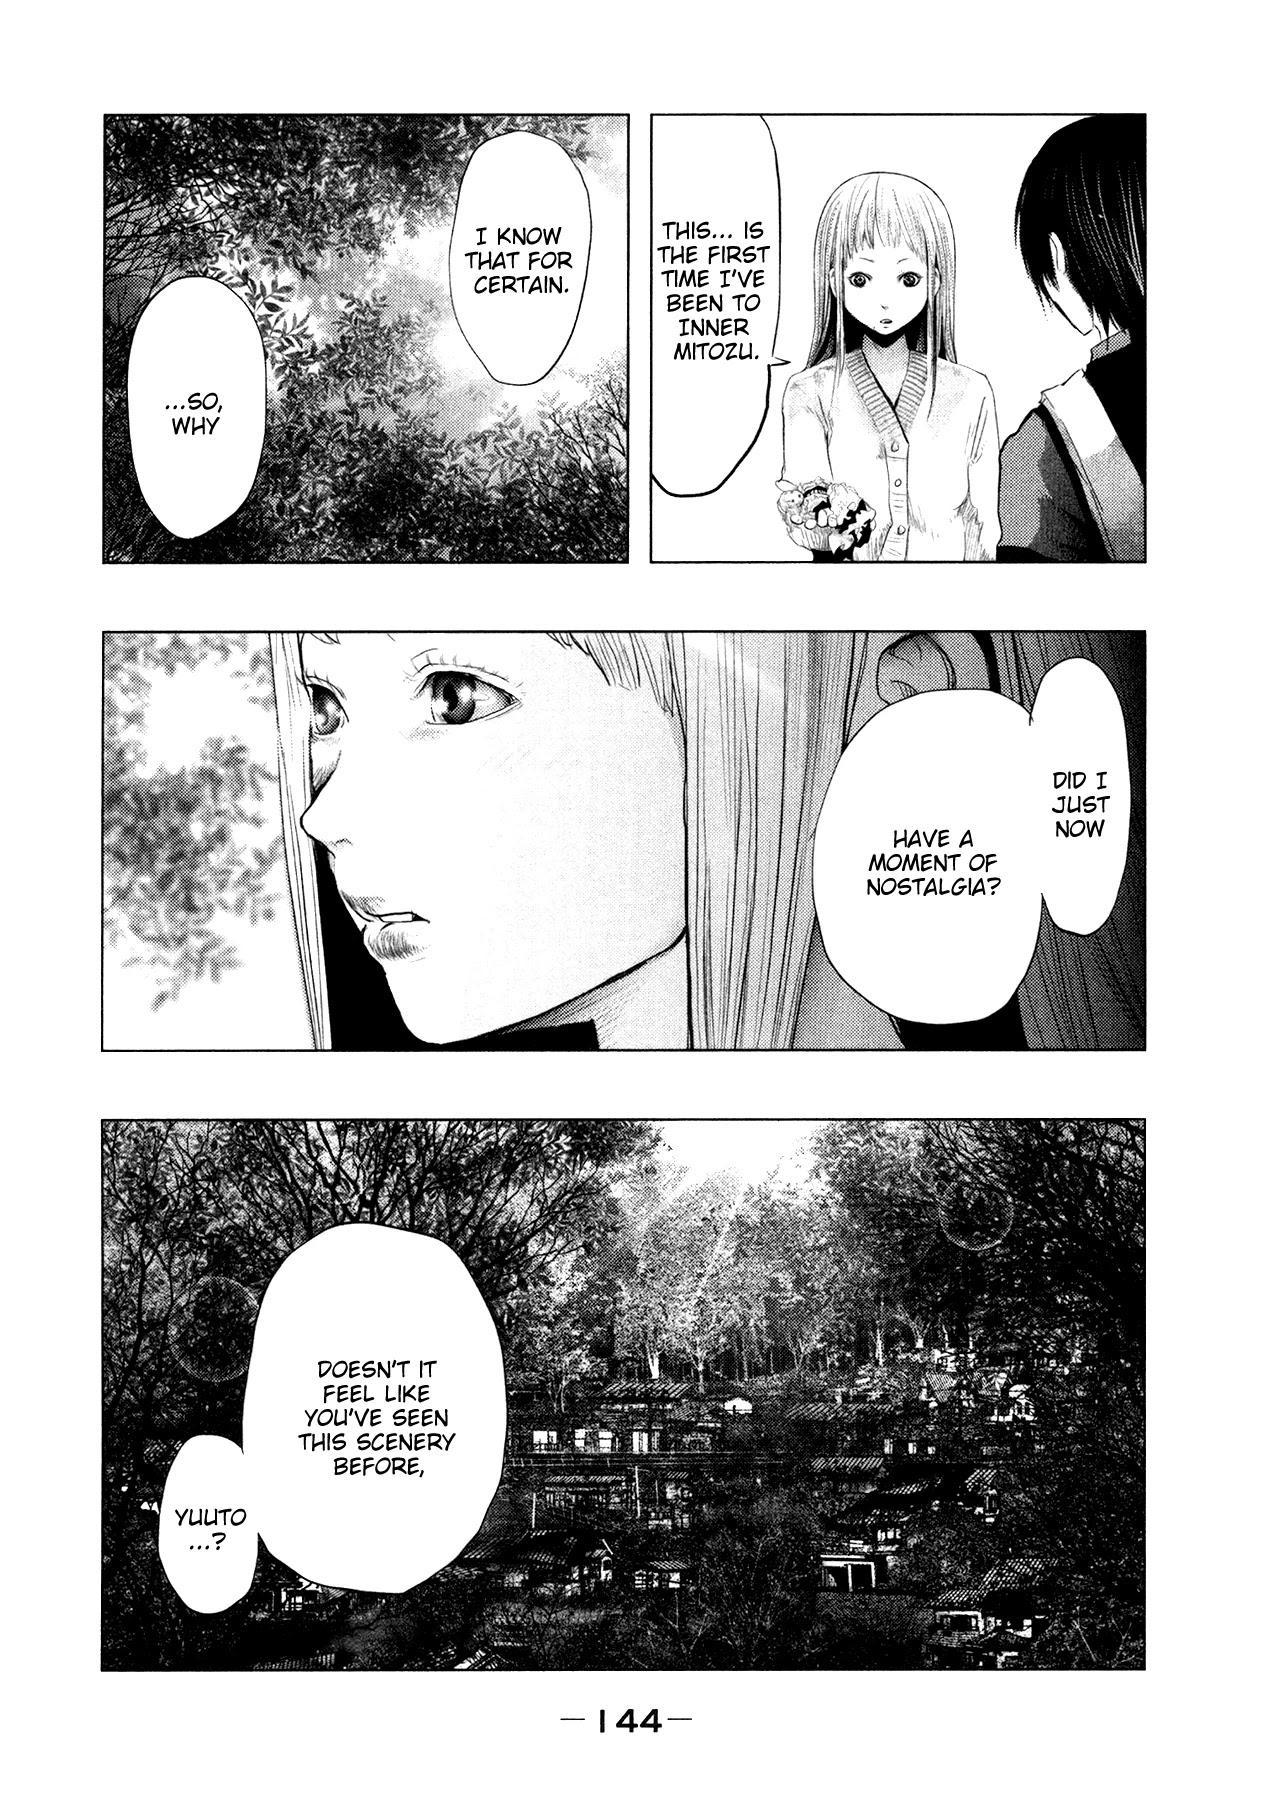 Kasouba No Nai Machi Ni Kane Ga Naru Toki Chapter 93: Let's Leave Mitozu page 13 - Mangakakalots.com